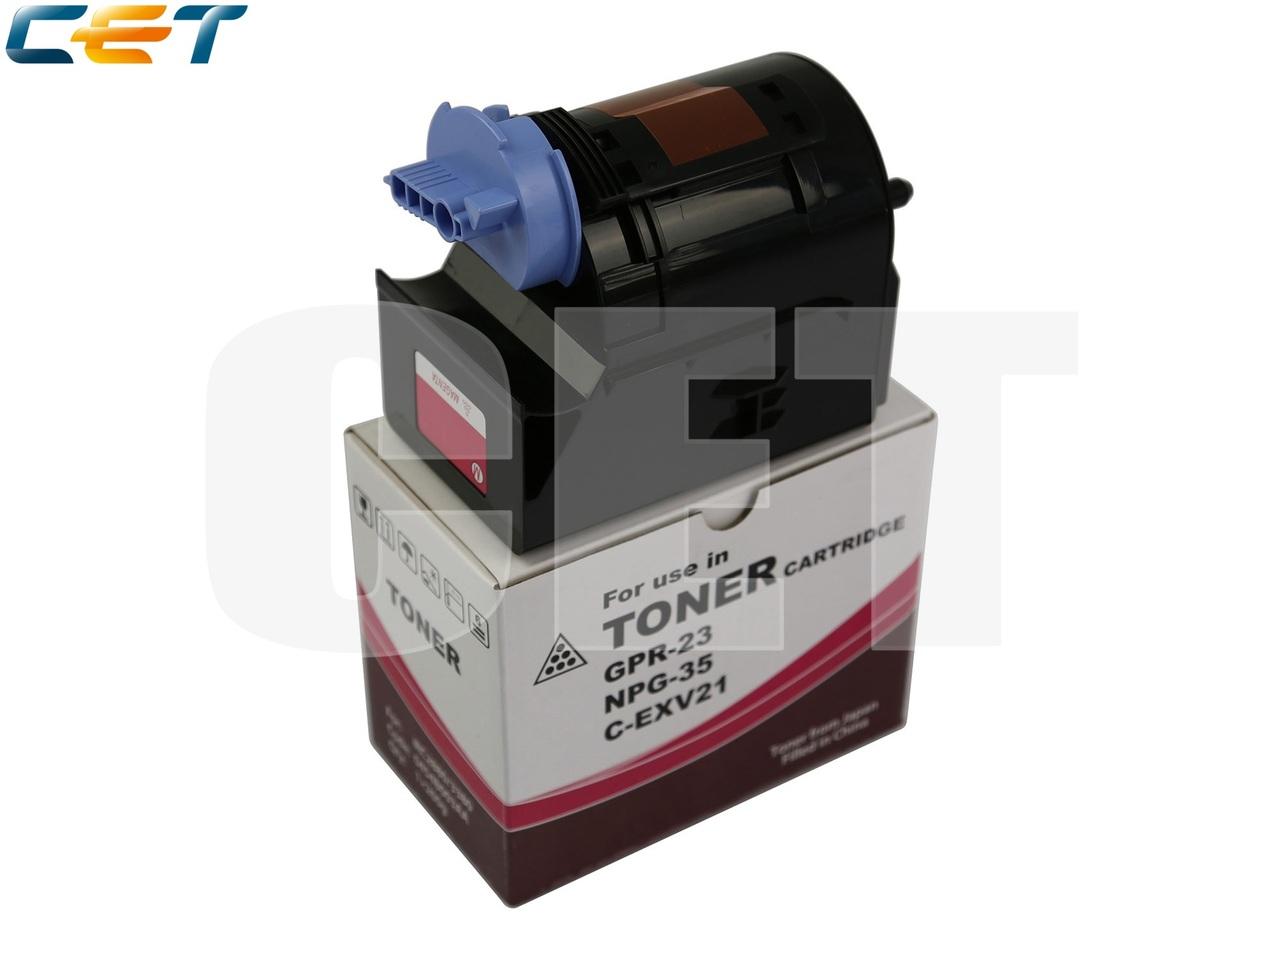 Тонер-картридж C-EXV21 для CANON iRC2880/C3380 (CET)Magenta, 260г, 14000 стр., CET6570